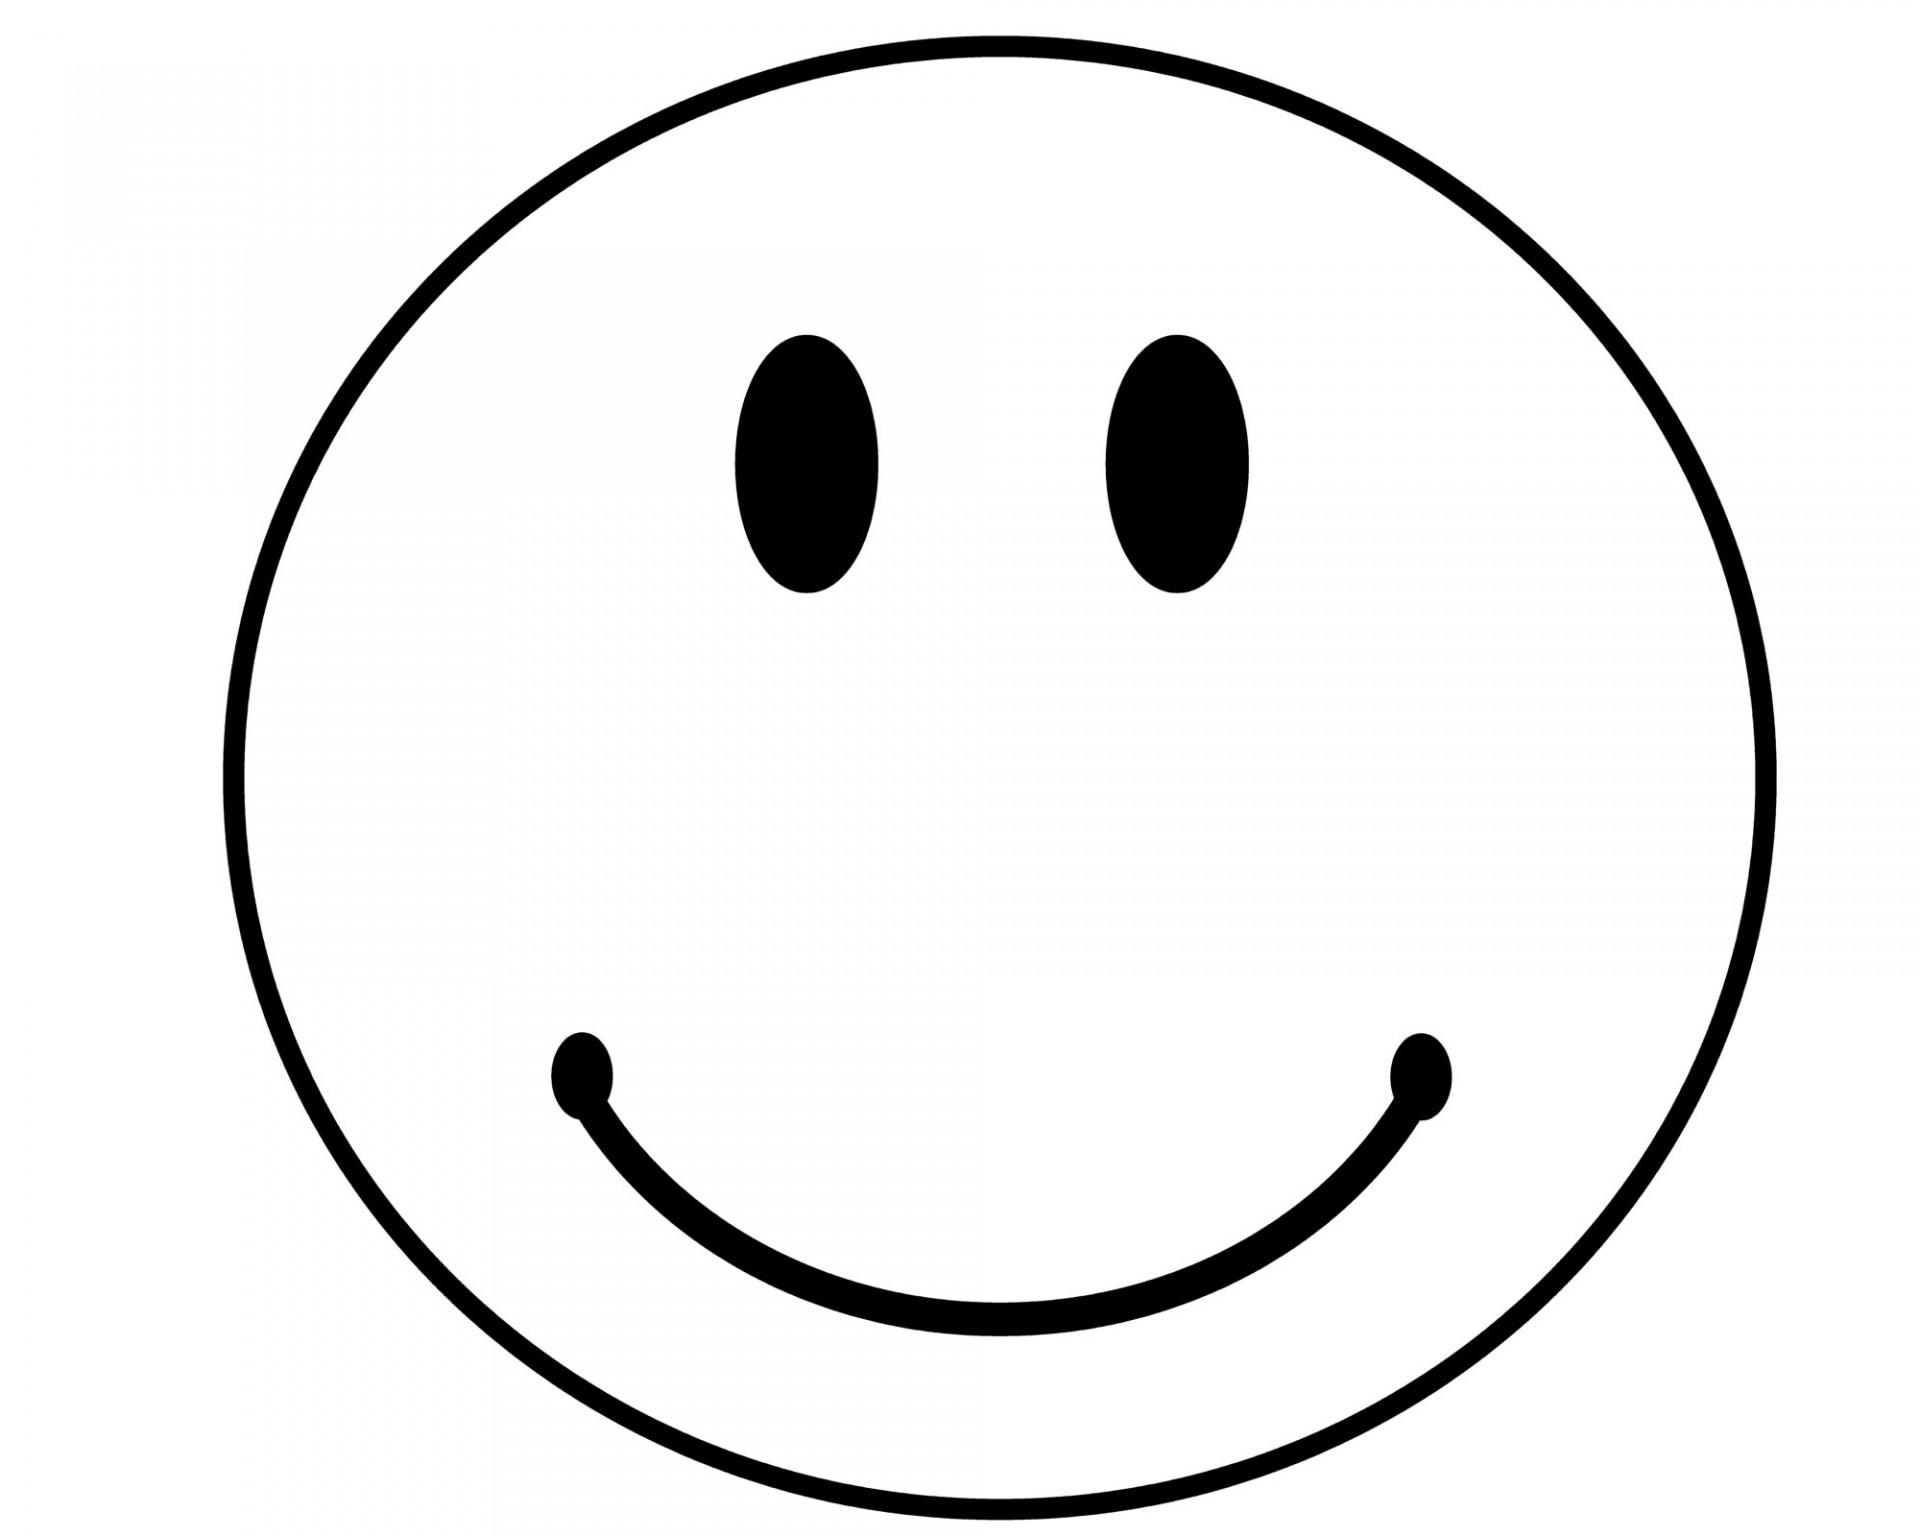 Happy Faces Clipart - clipart - Happy Face Clipart